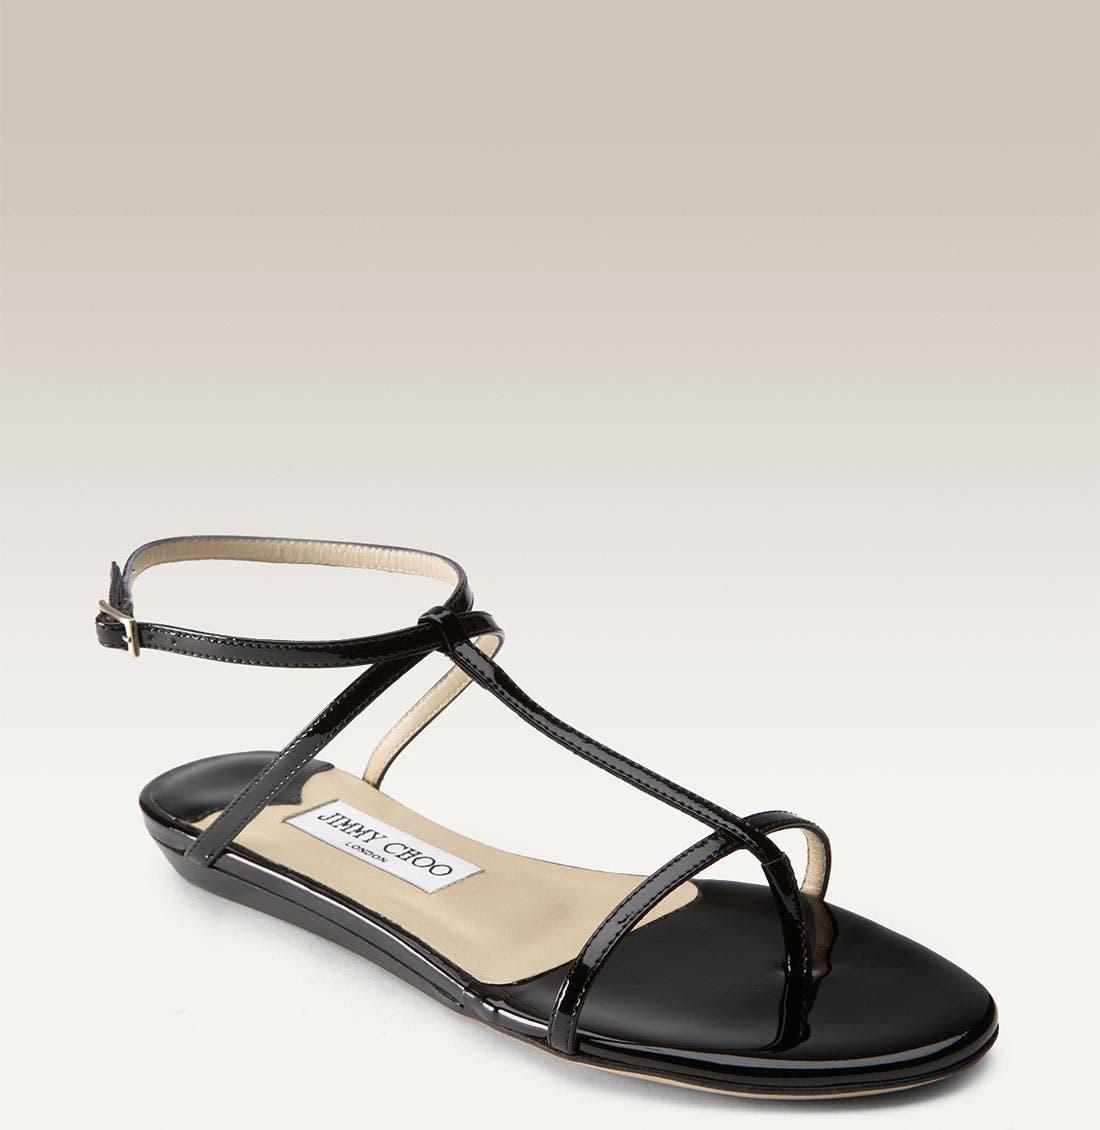 Main Image - Jimmy Choo 'Fiona' T-Strap Sandal